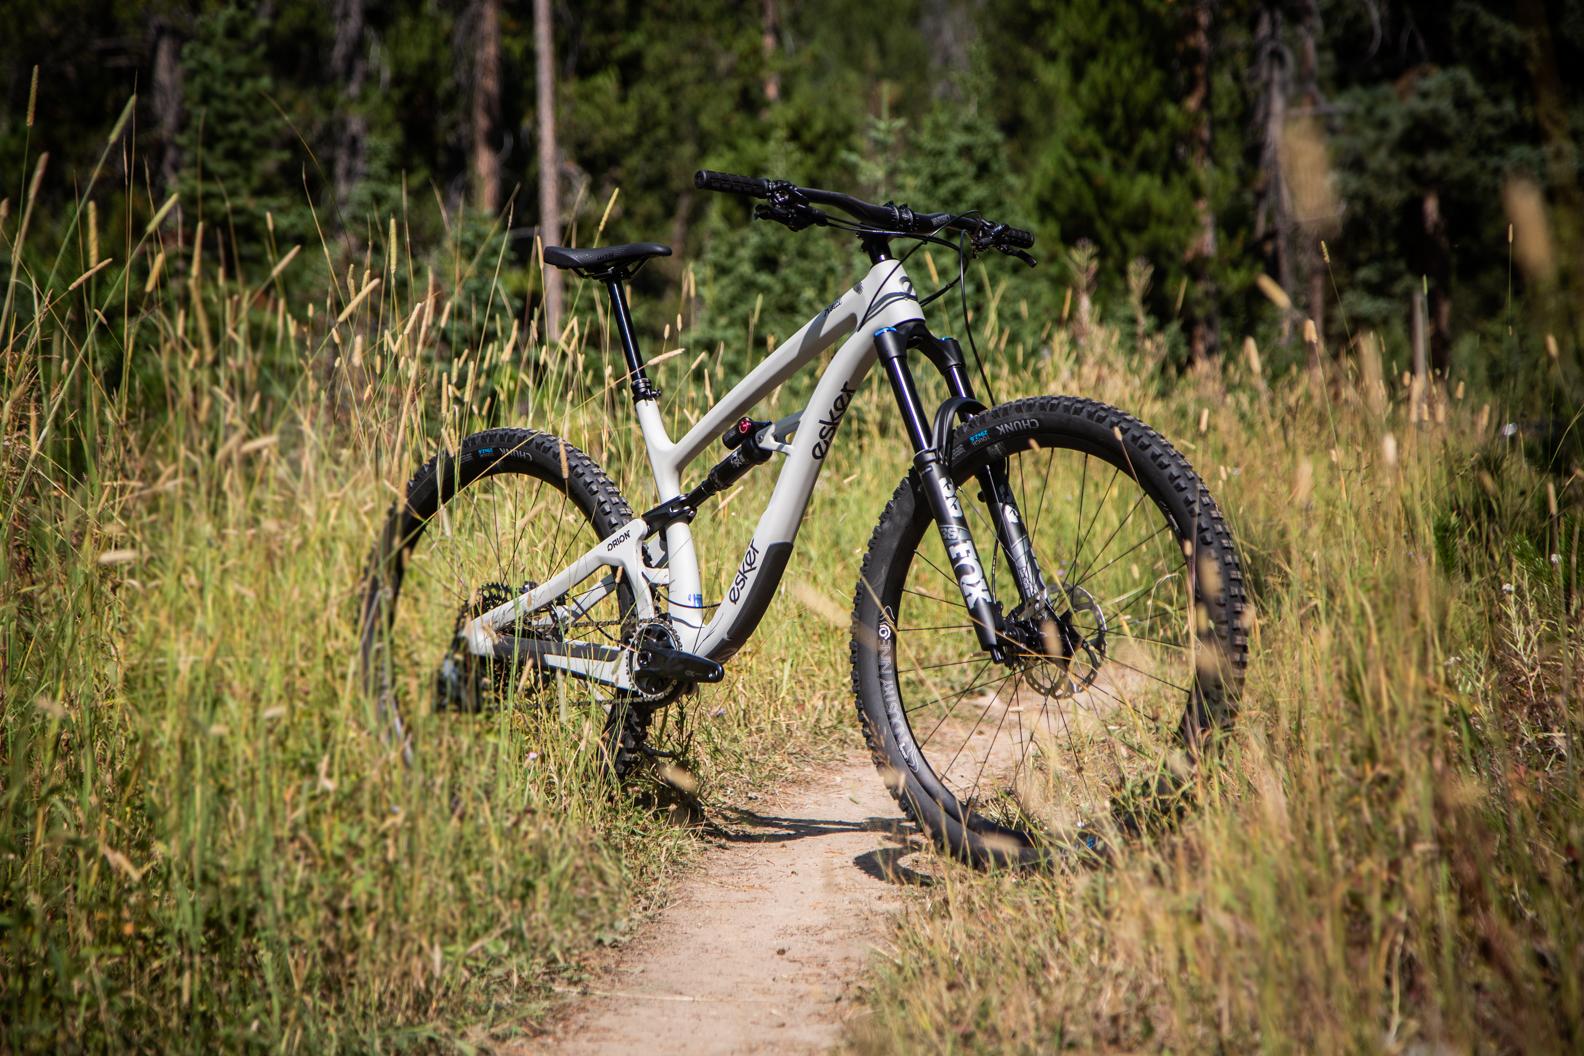 Esker Cycles Adds the Rowl to Lineup, a 140mm 29er Trail Bike - Singletracks Mountain Bike News